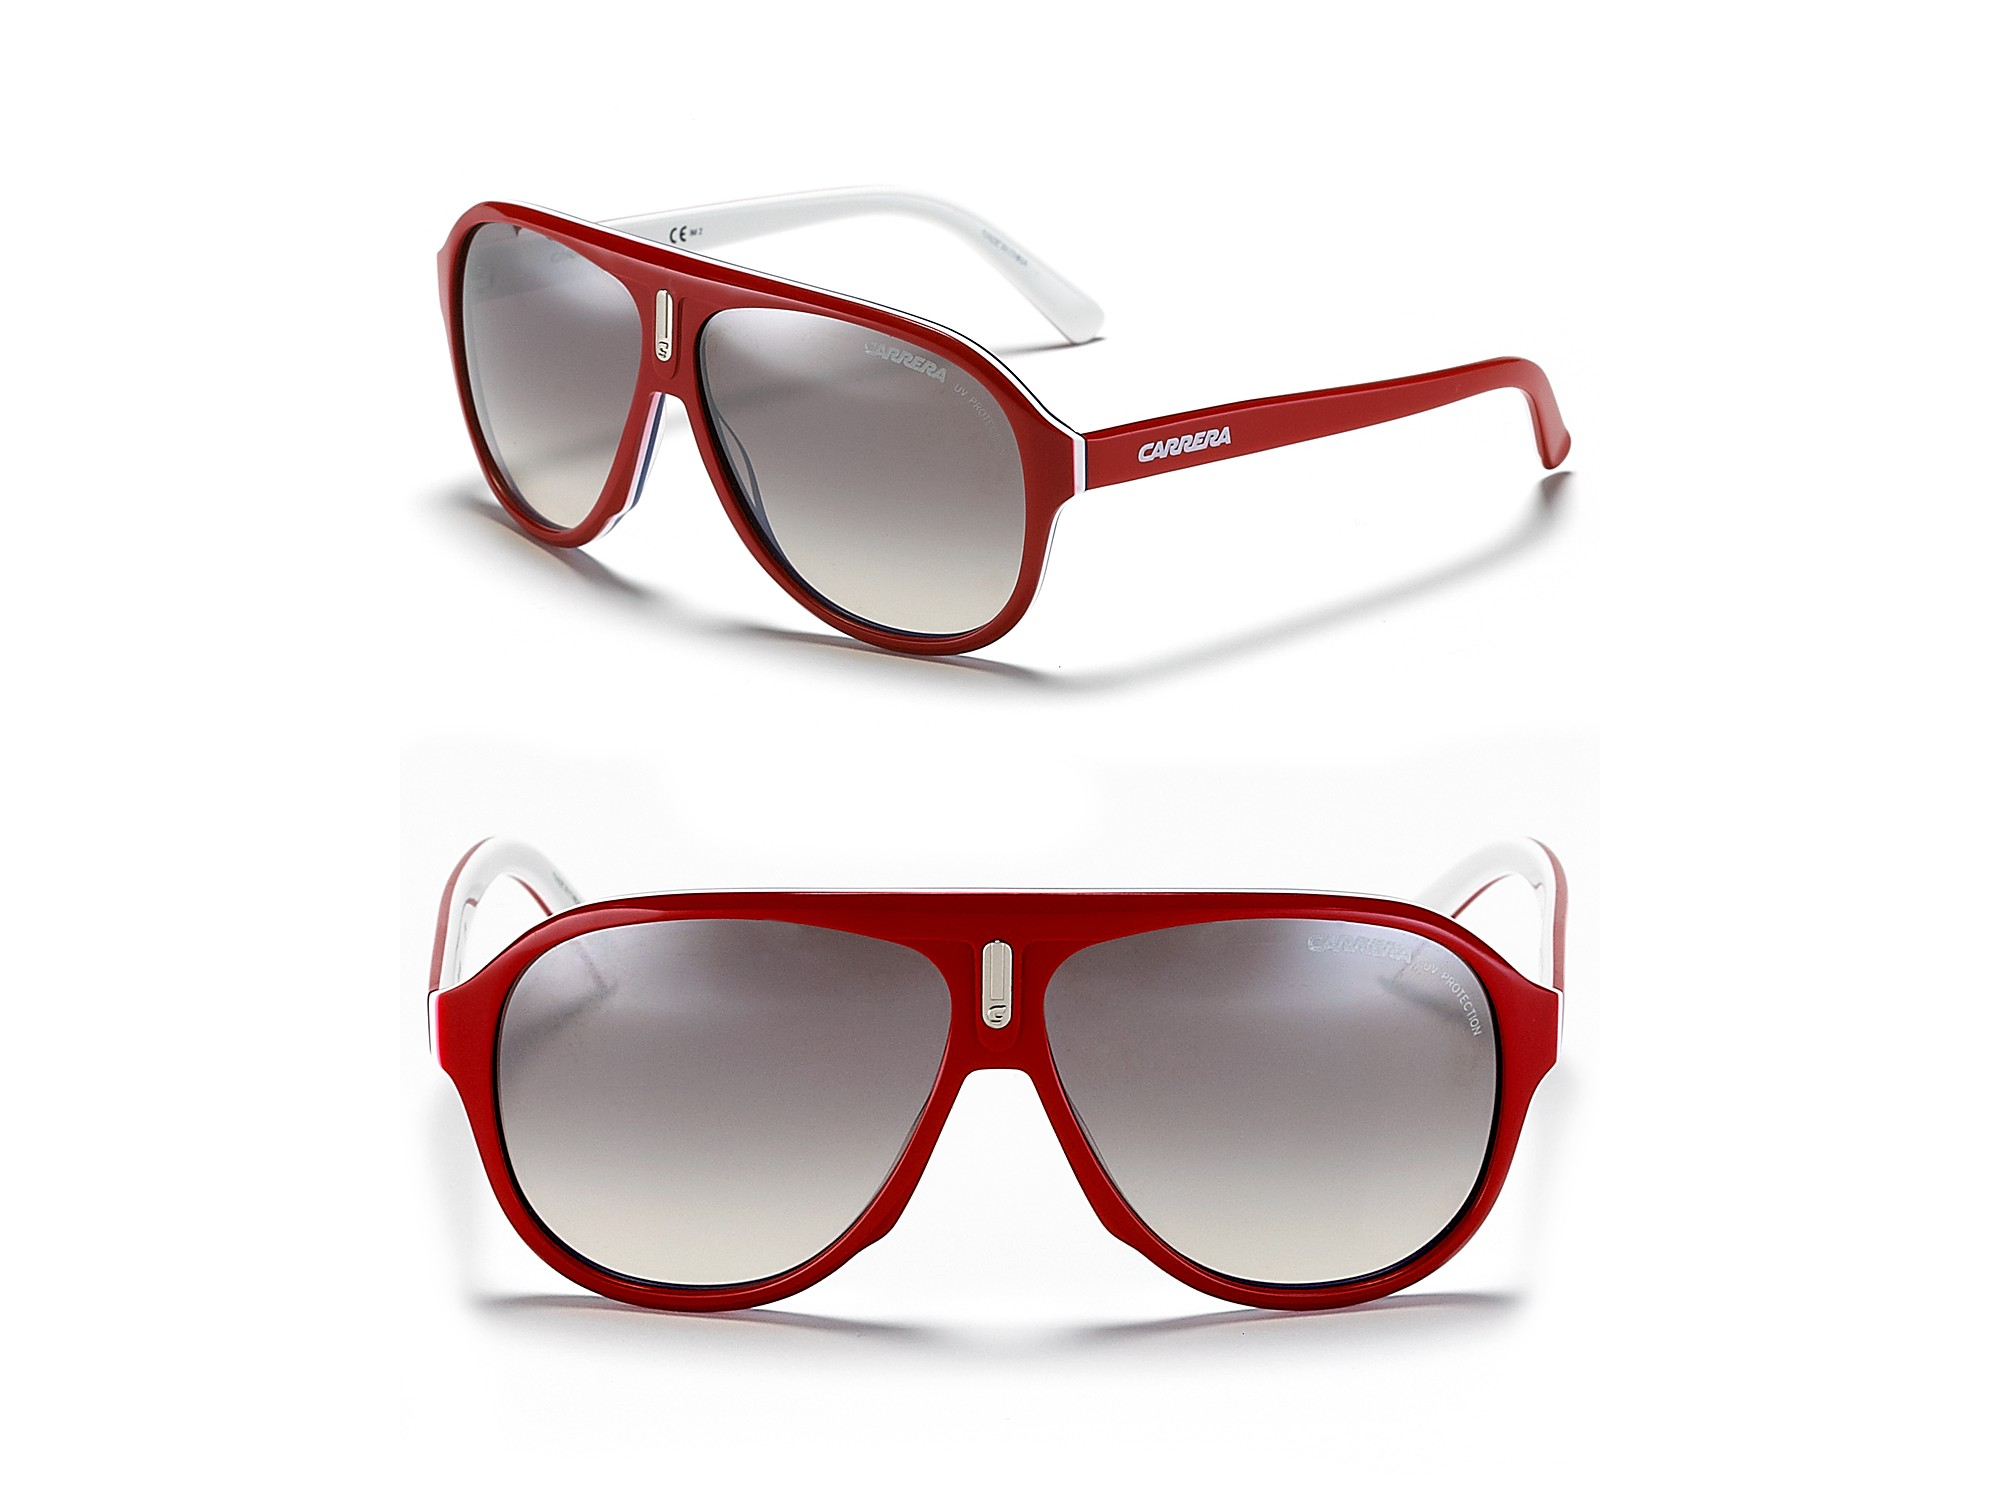 d1bdbc828f9 Mens Red Aviator Sunglasses